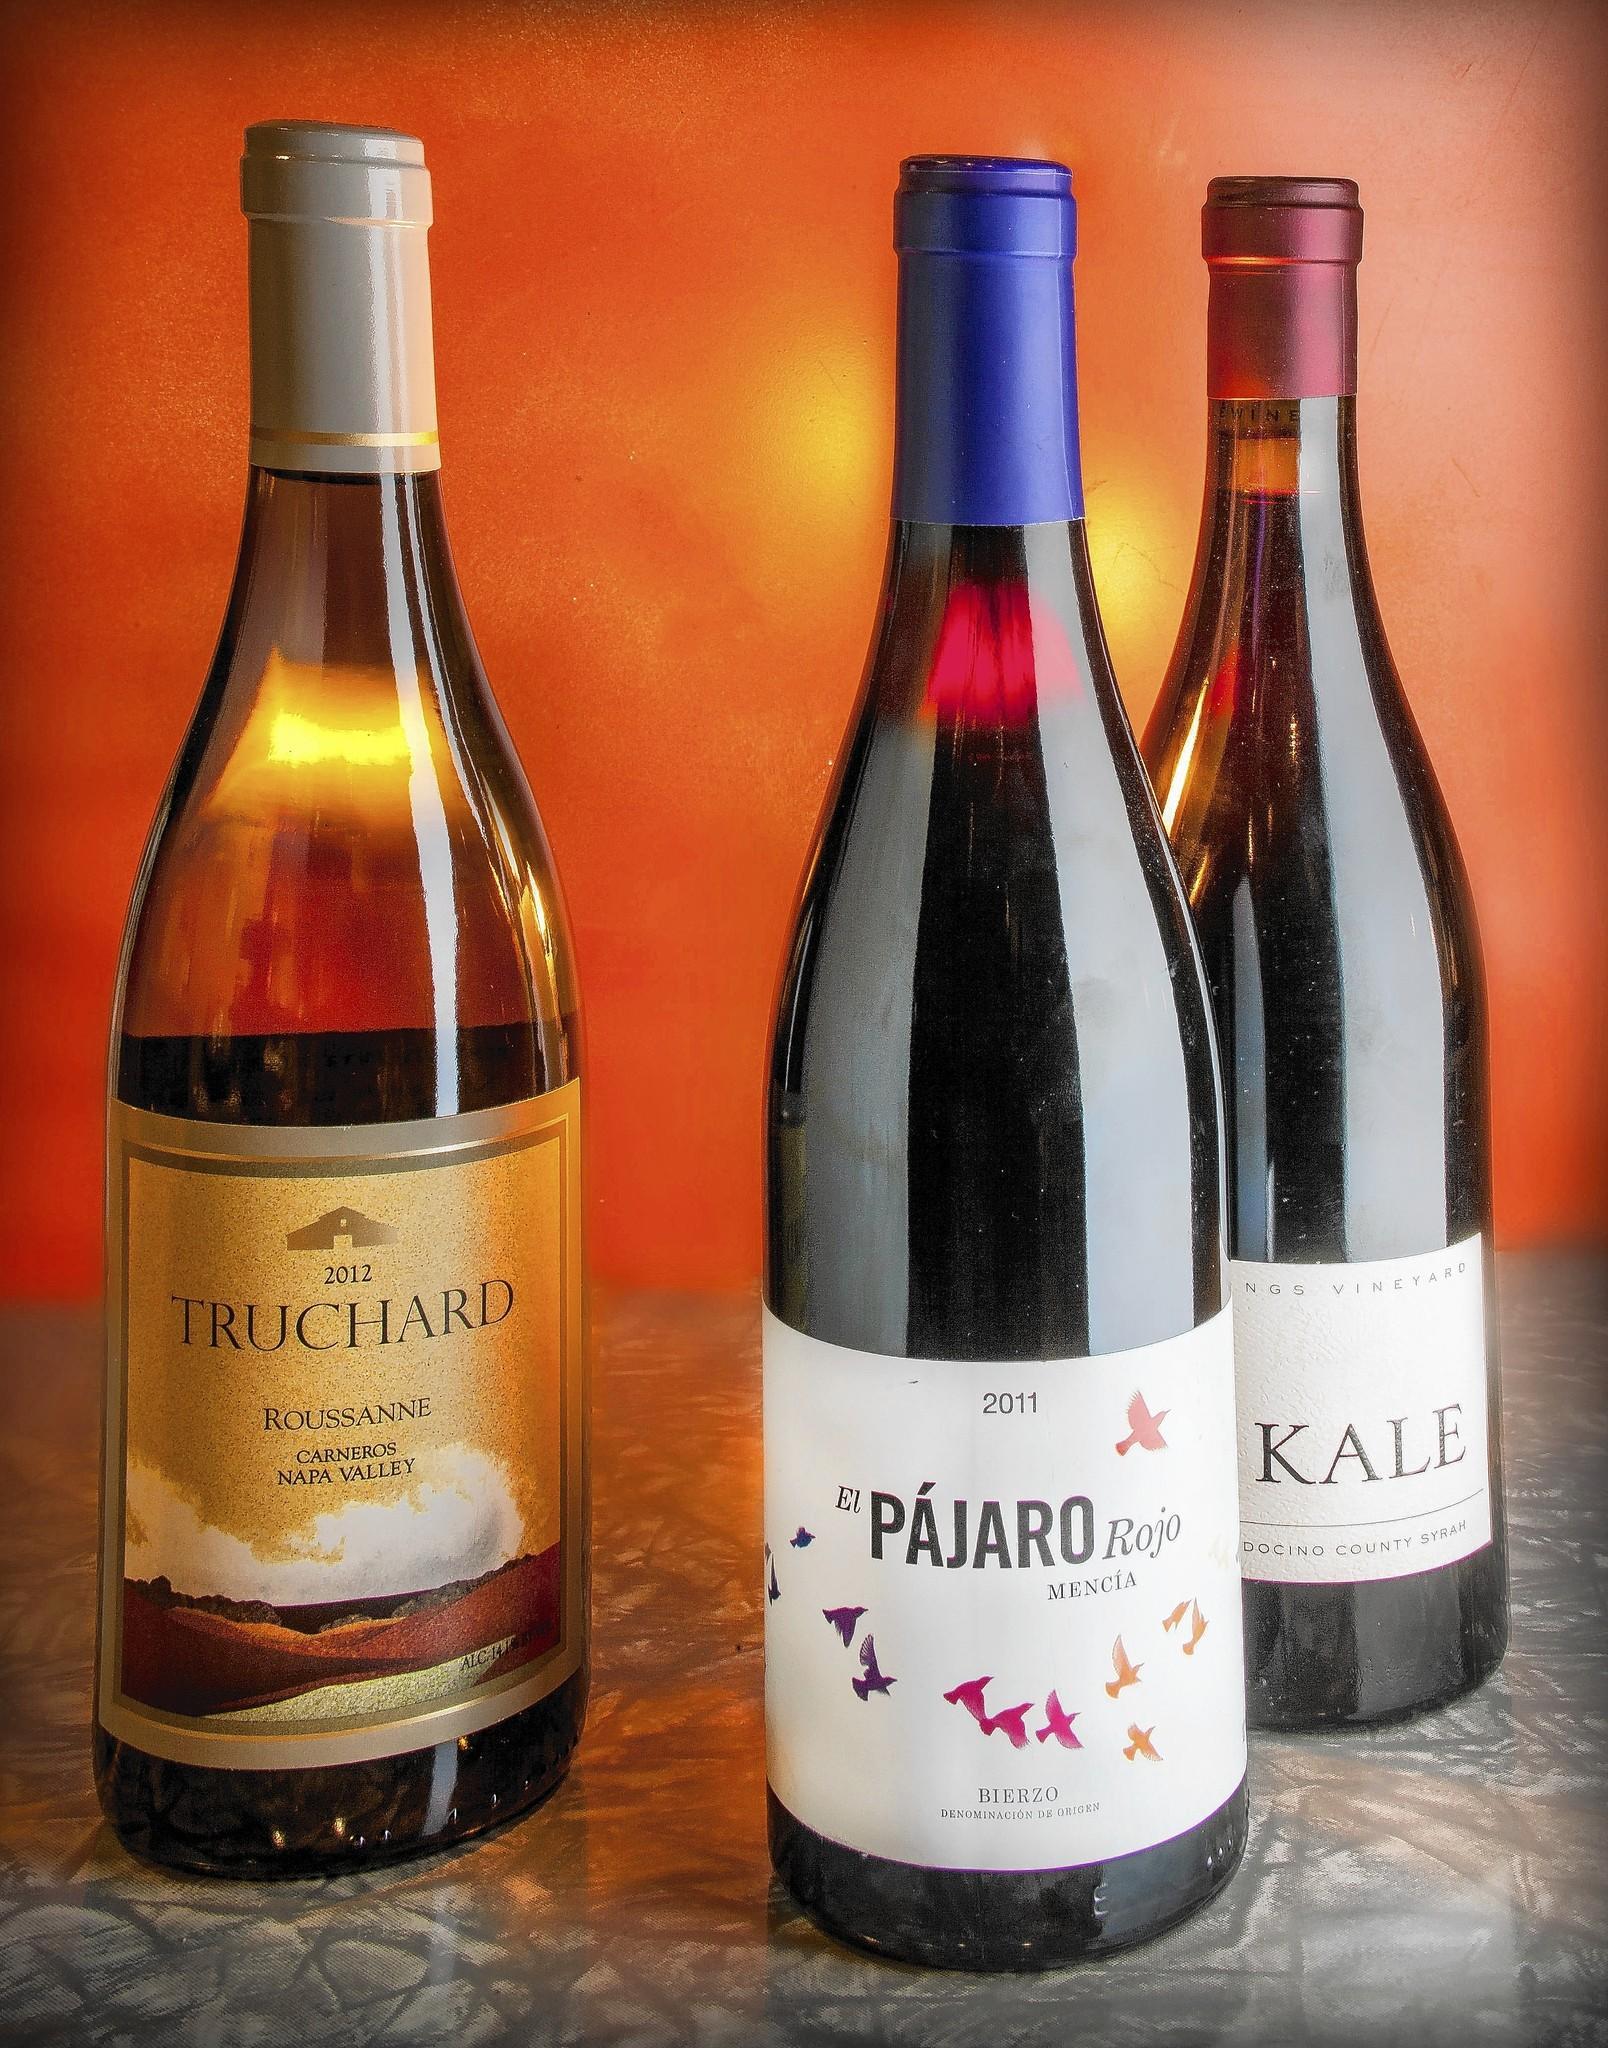 Three bottles of wine, Truchard, El Pajaro Rojo, and Kale.